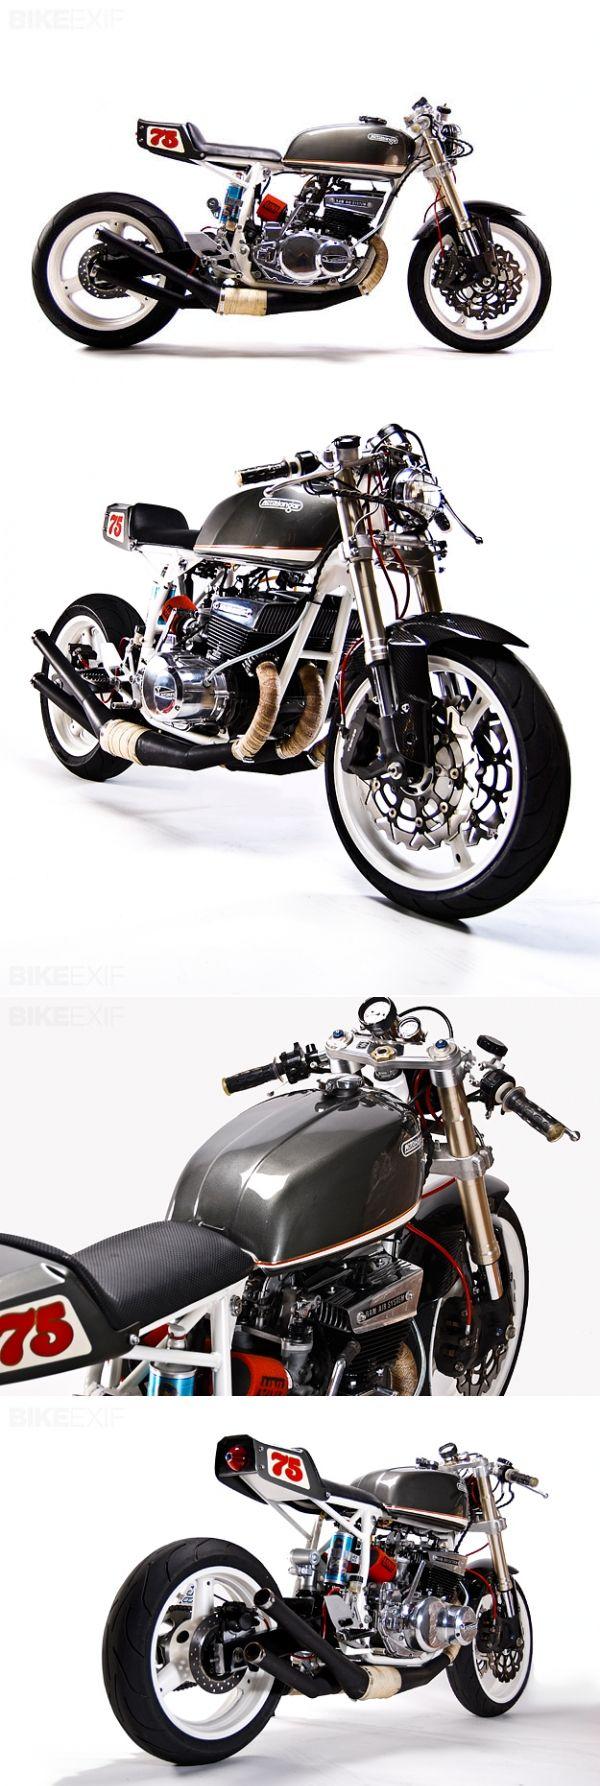 Suzuki Gt 550 Custom #caferacer #motorcycles | caferacerpasion.com